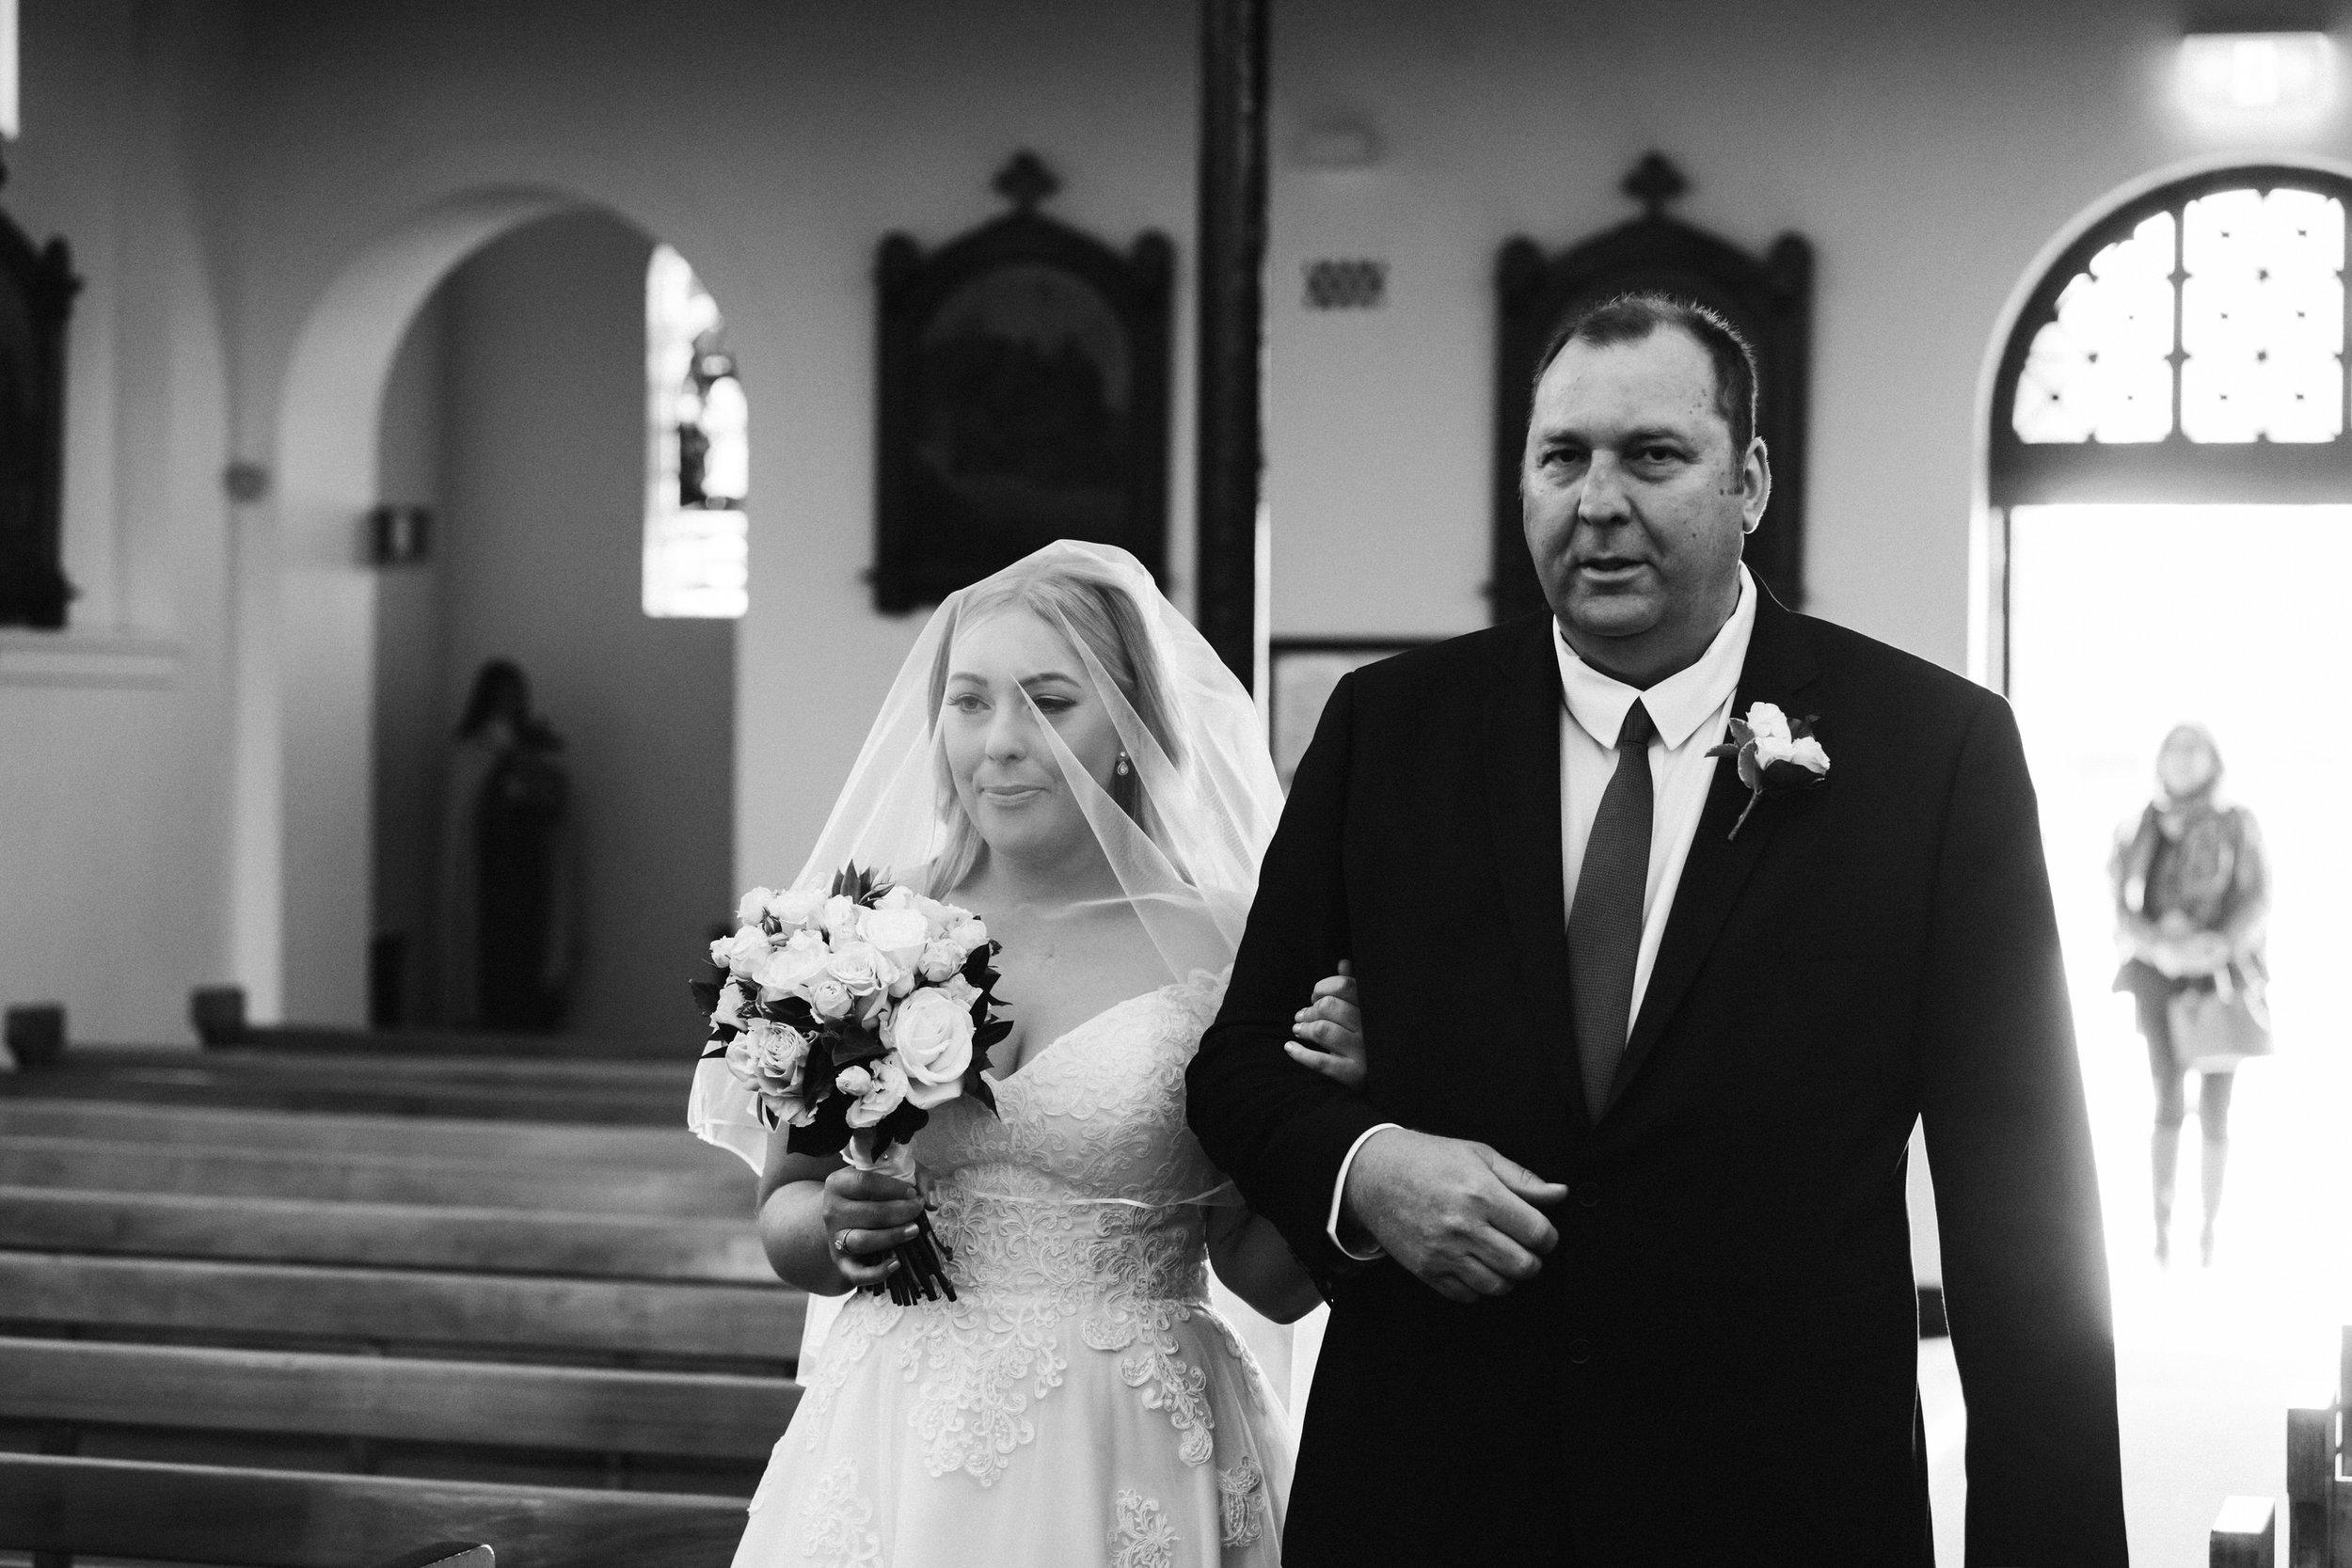 Adelaide Wedding Church Smoke Bomb Serafino 054.jpg